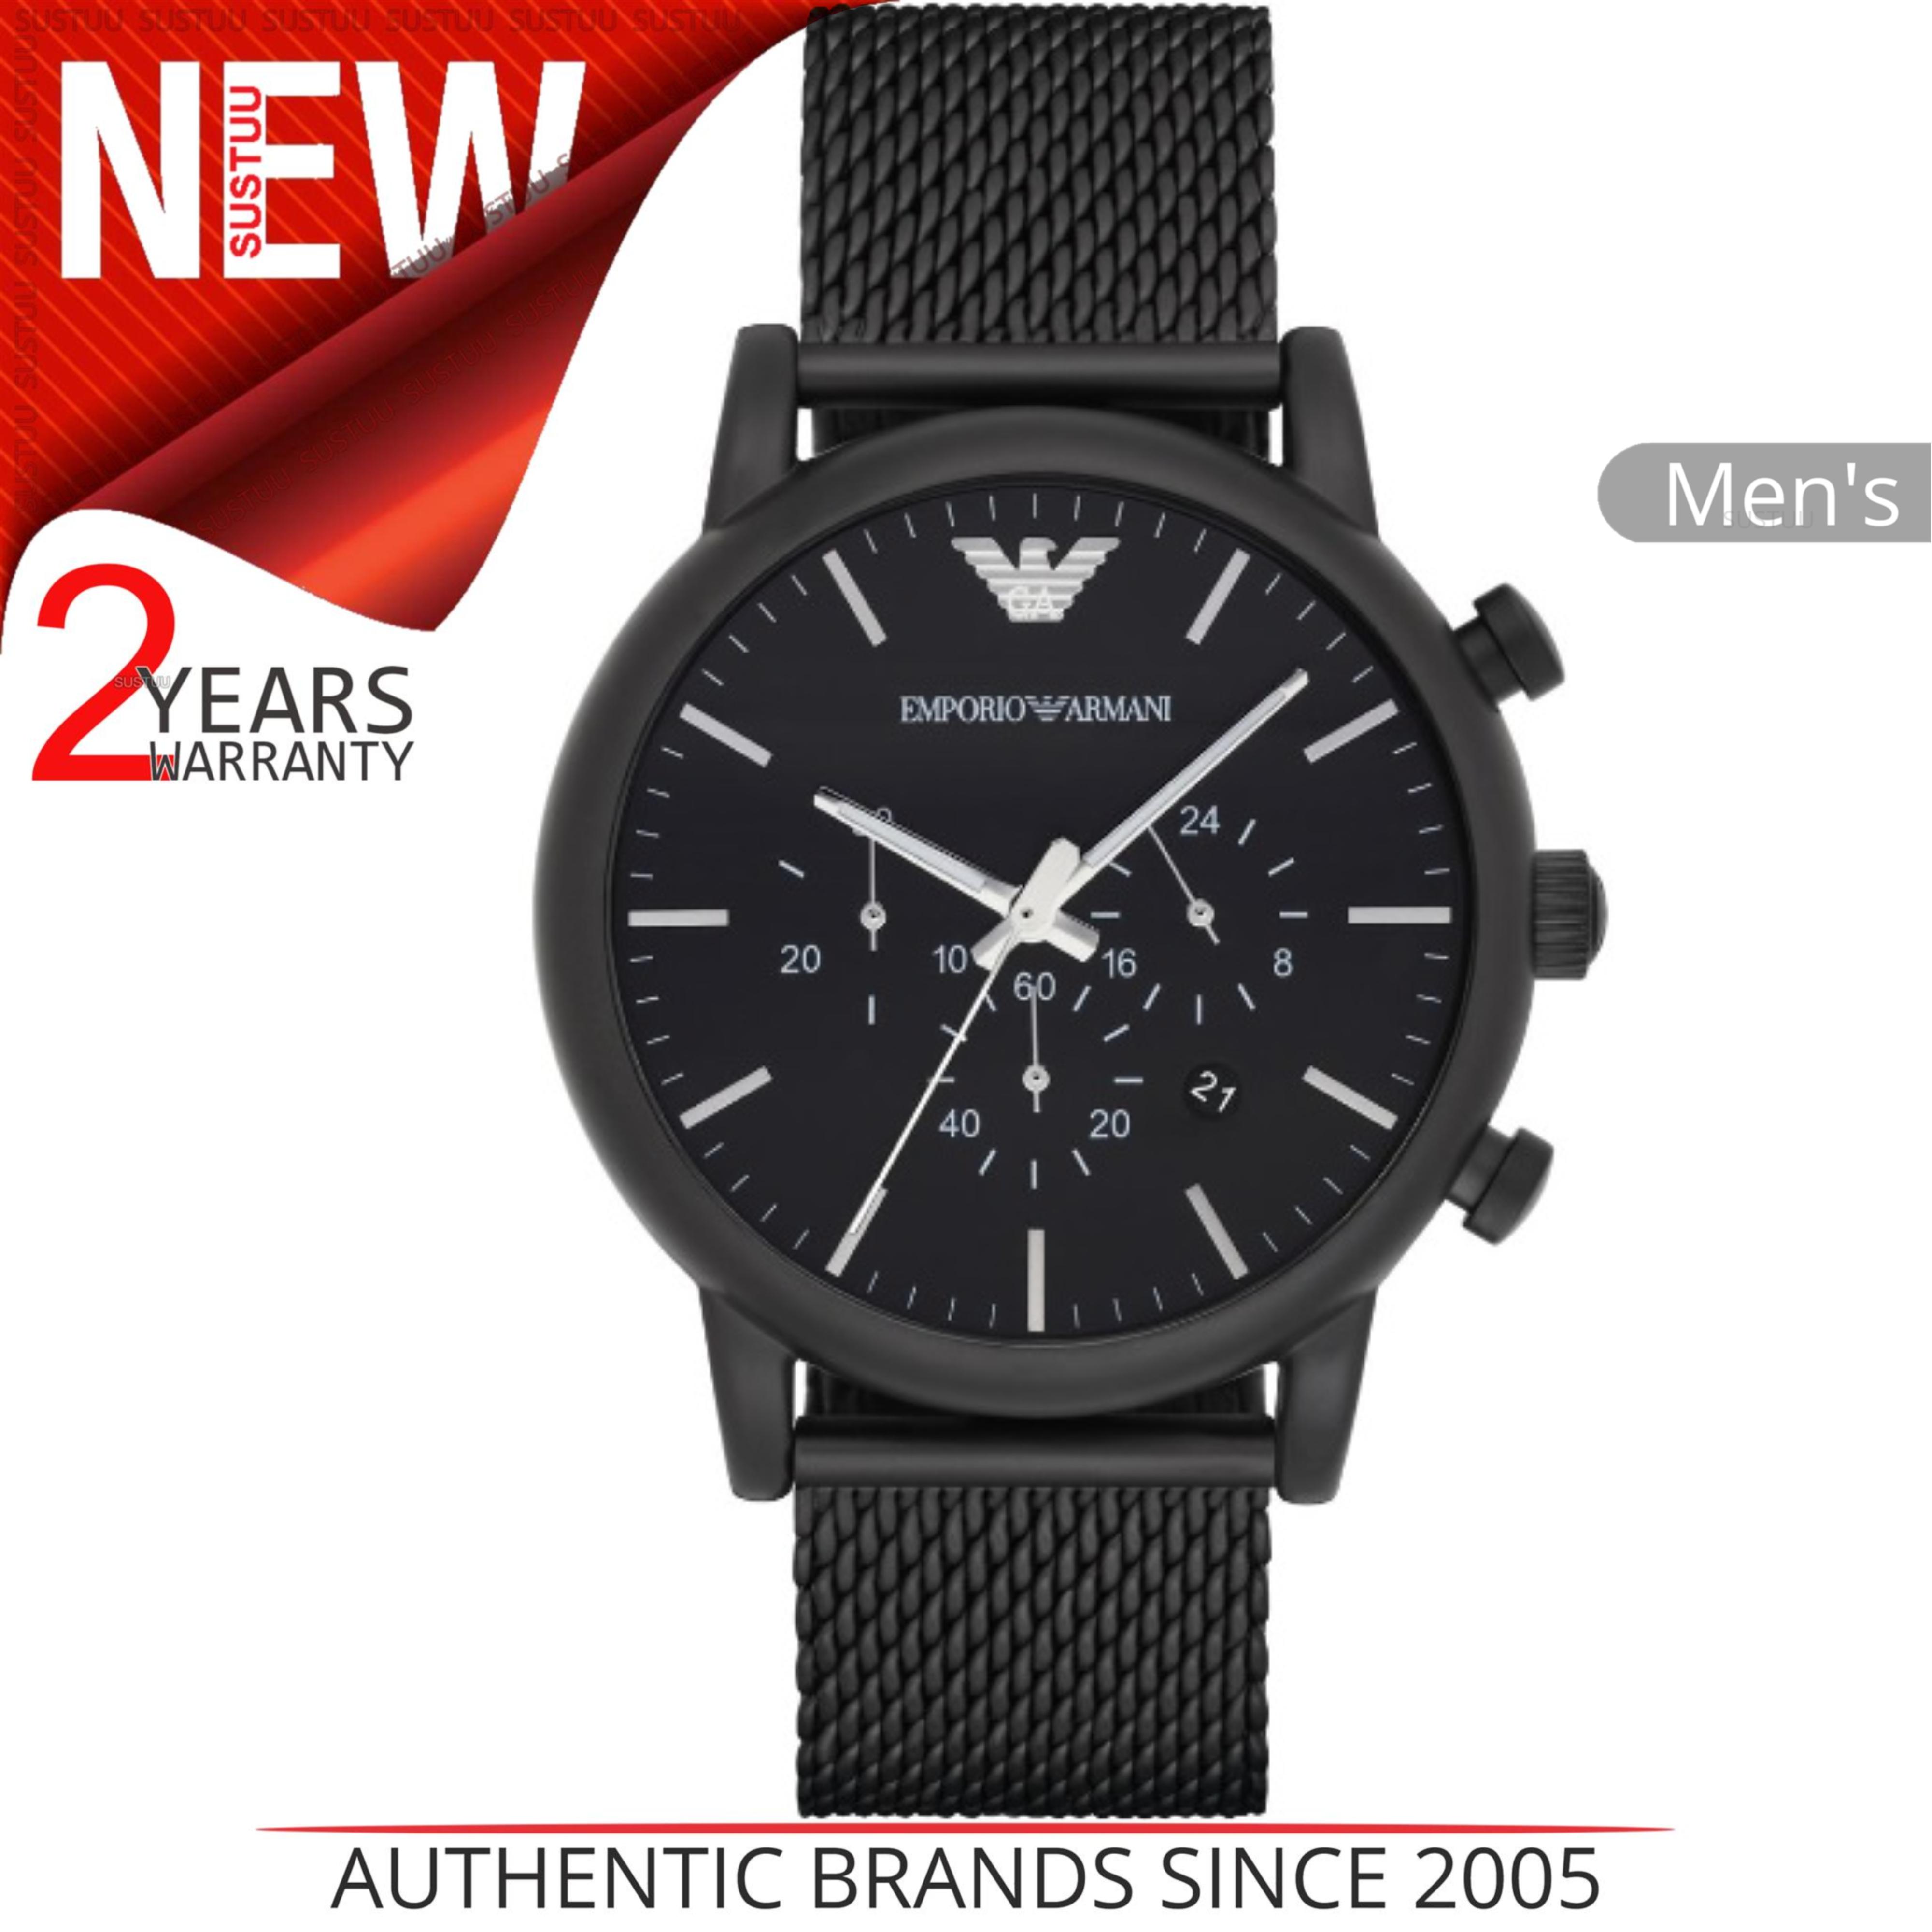 724d5a605fb9 Sentinel Emporio Armani Men s Sport Watch│Chronograph Dial│Black Mesh  Bracelet│AR1968